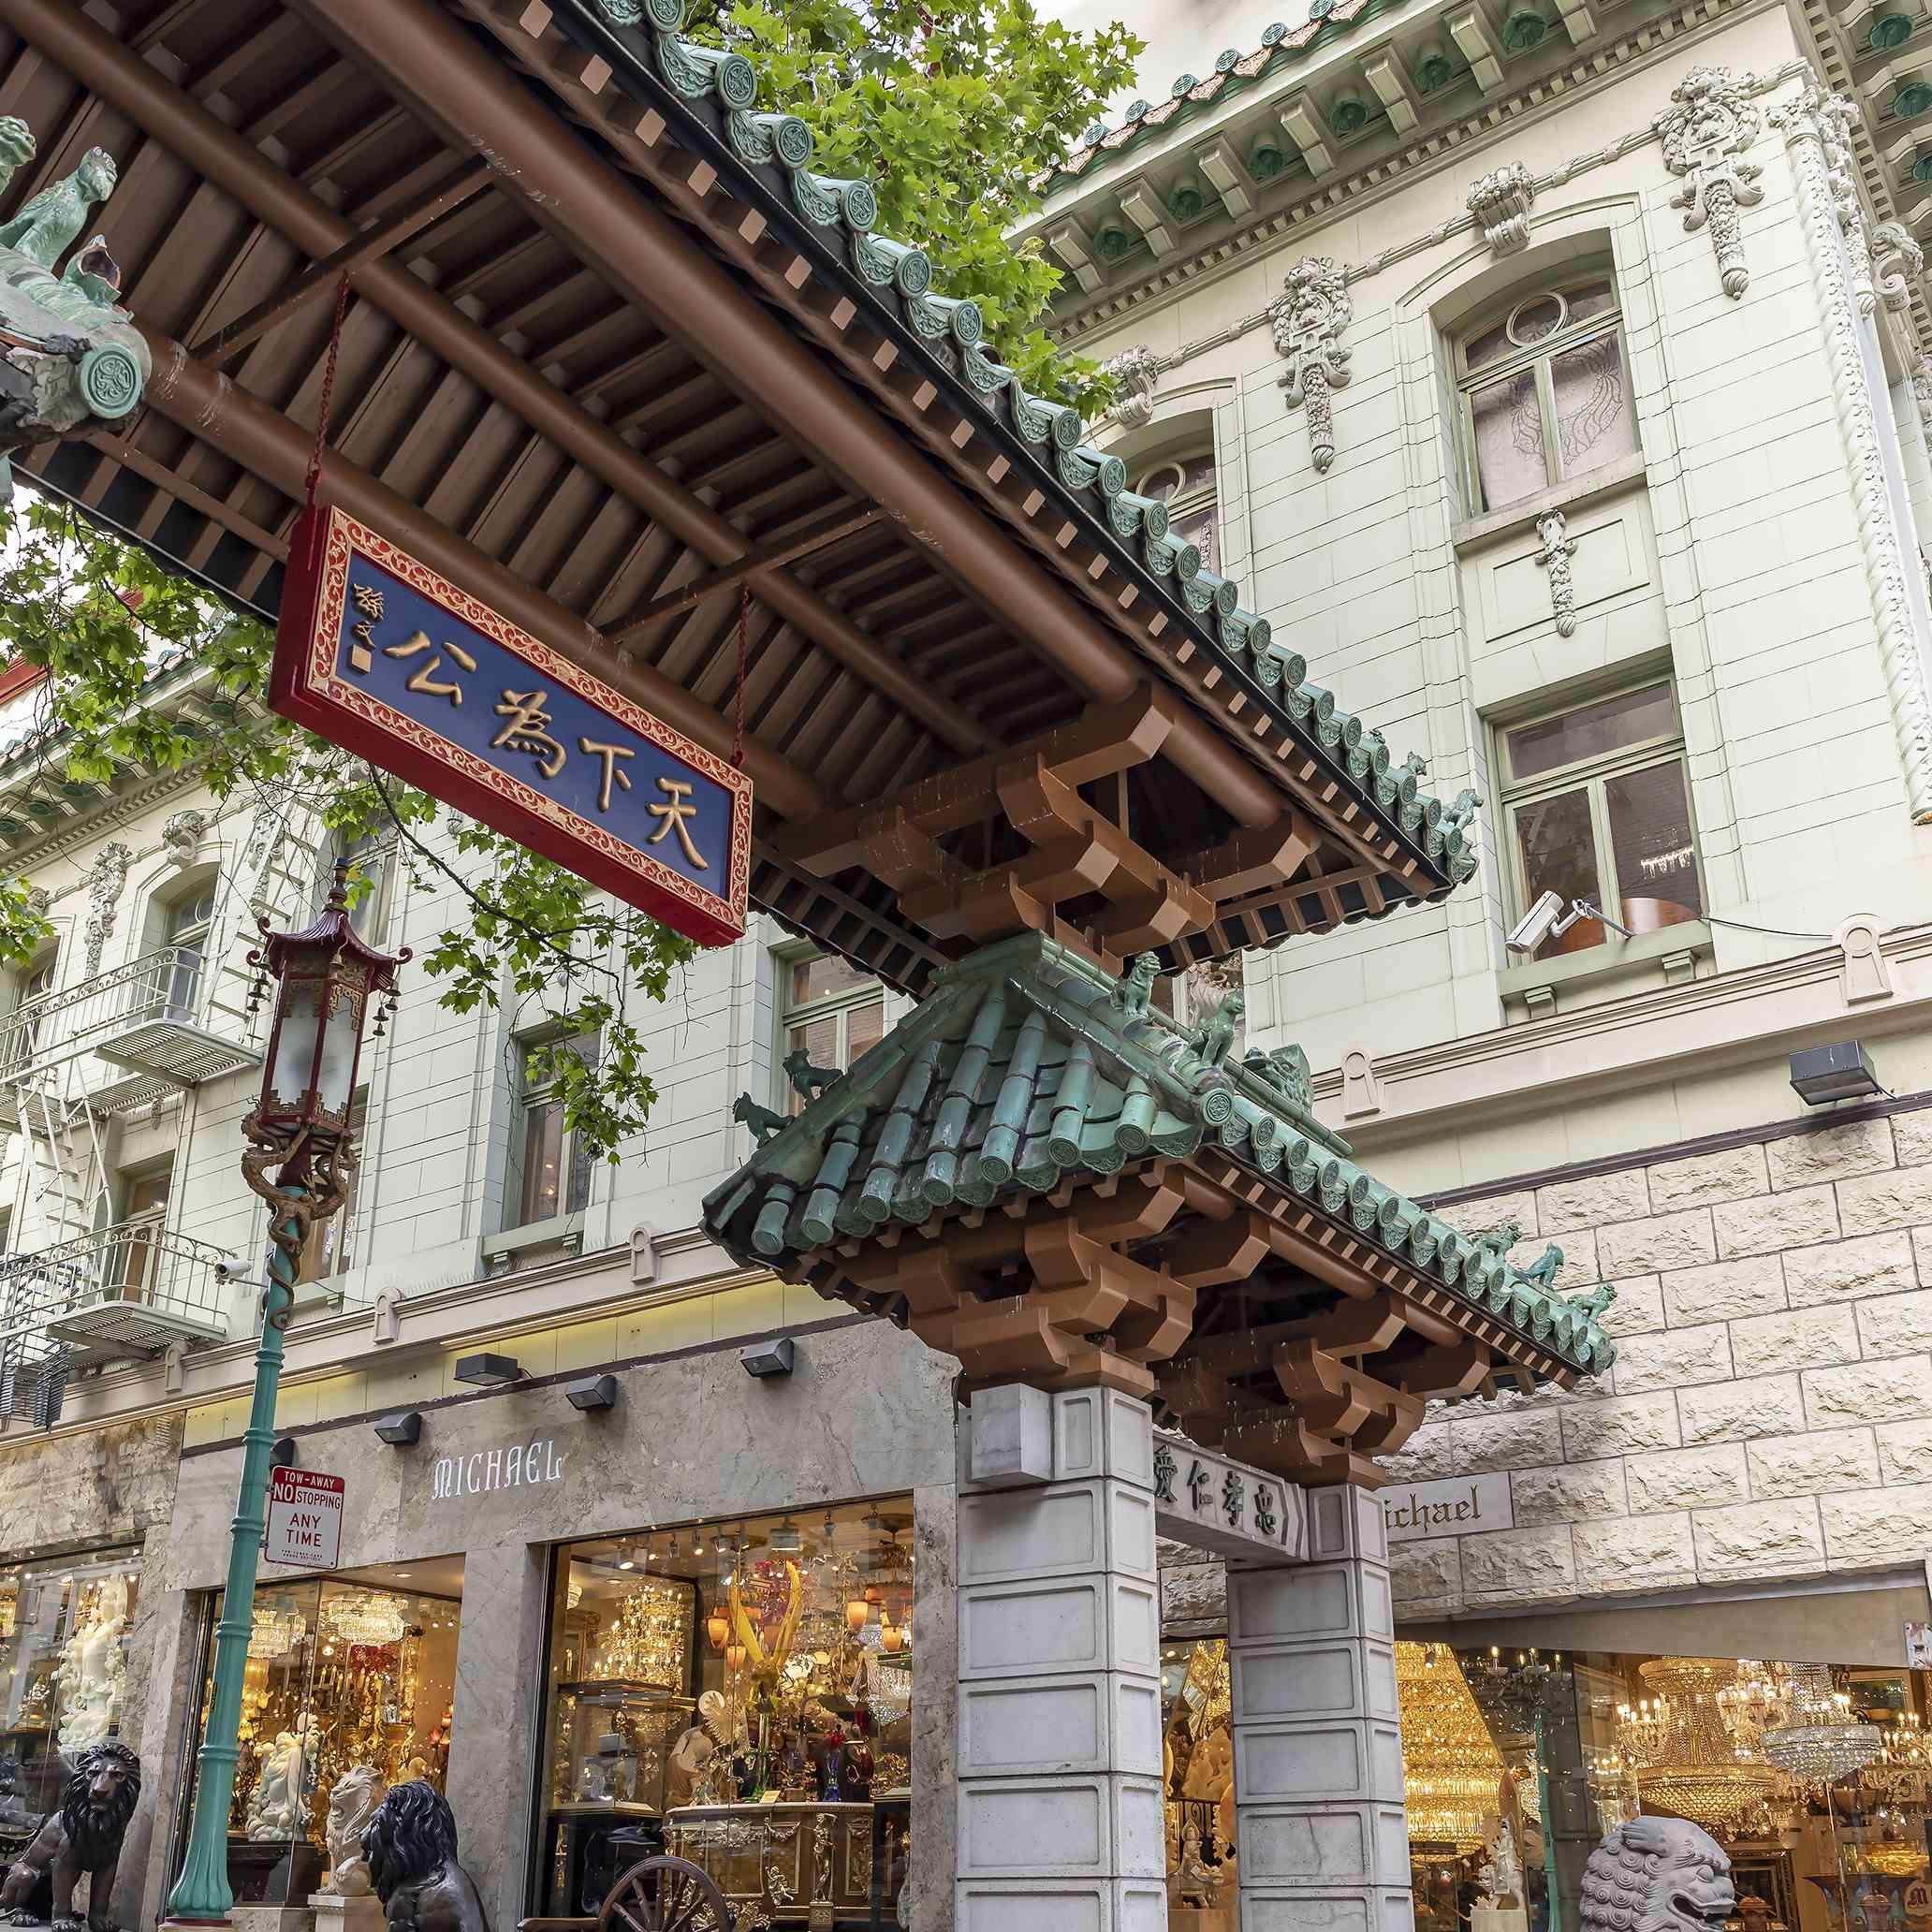 A gateway entrance to chinatown